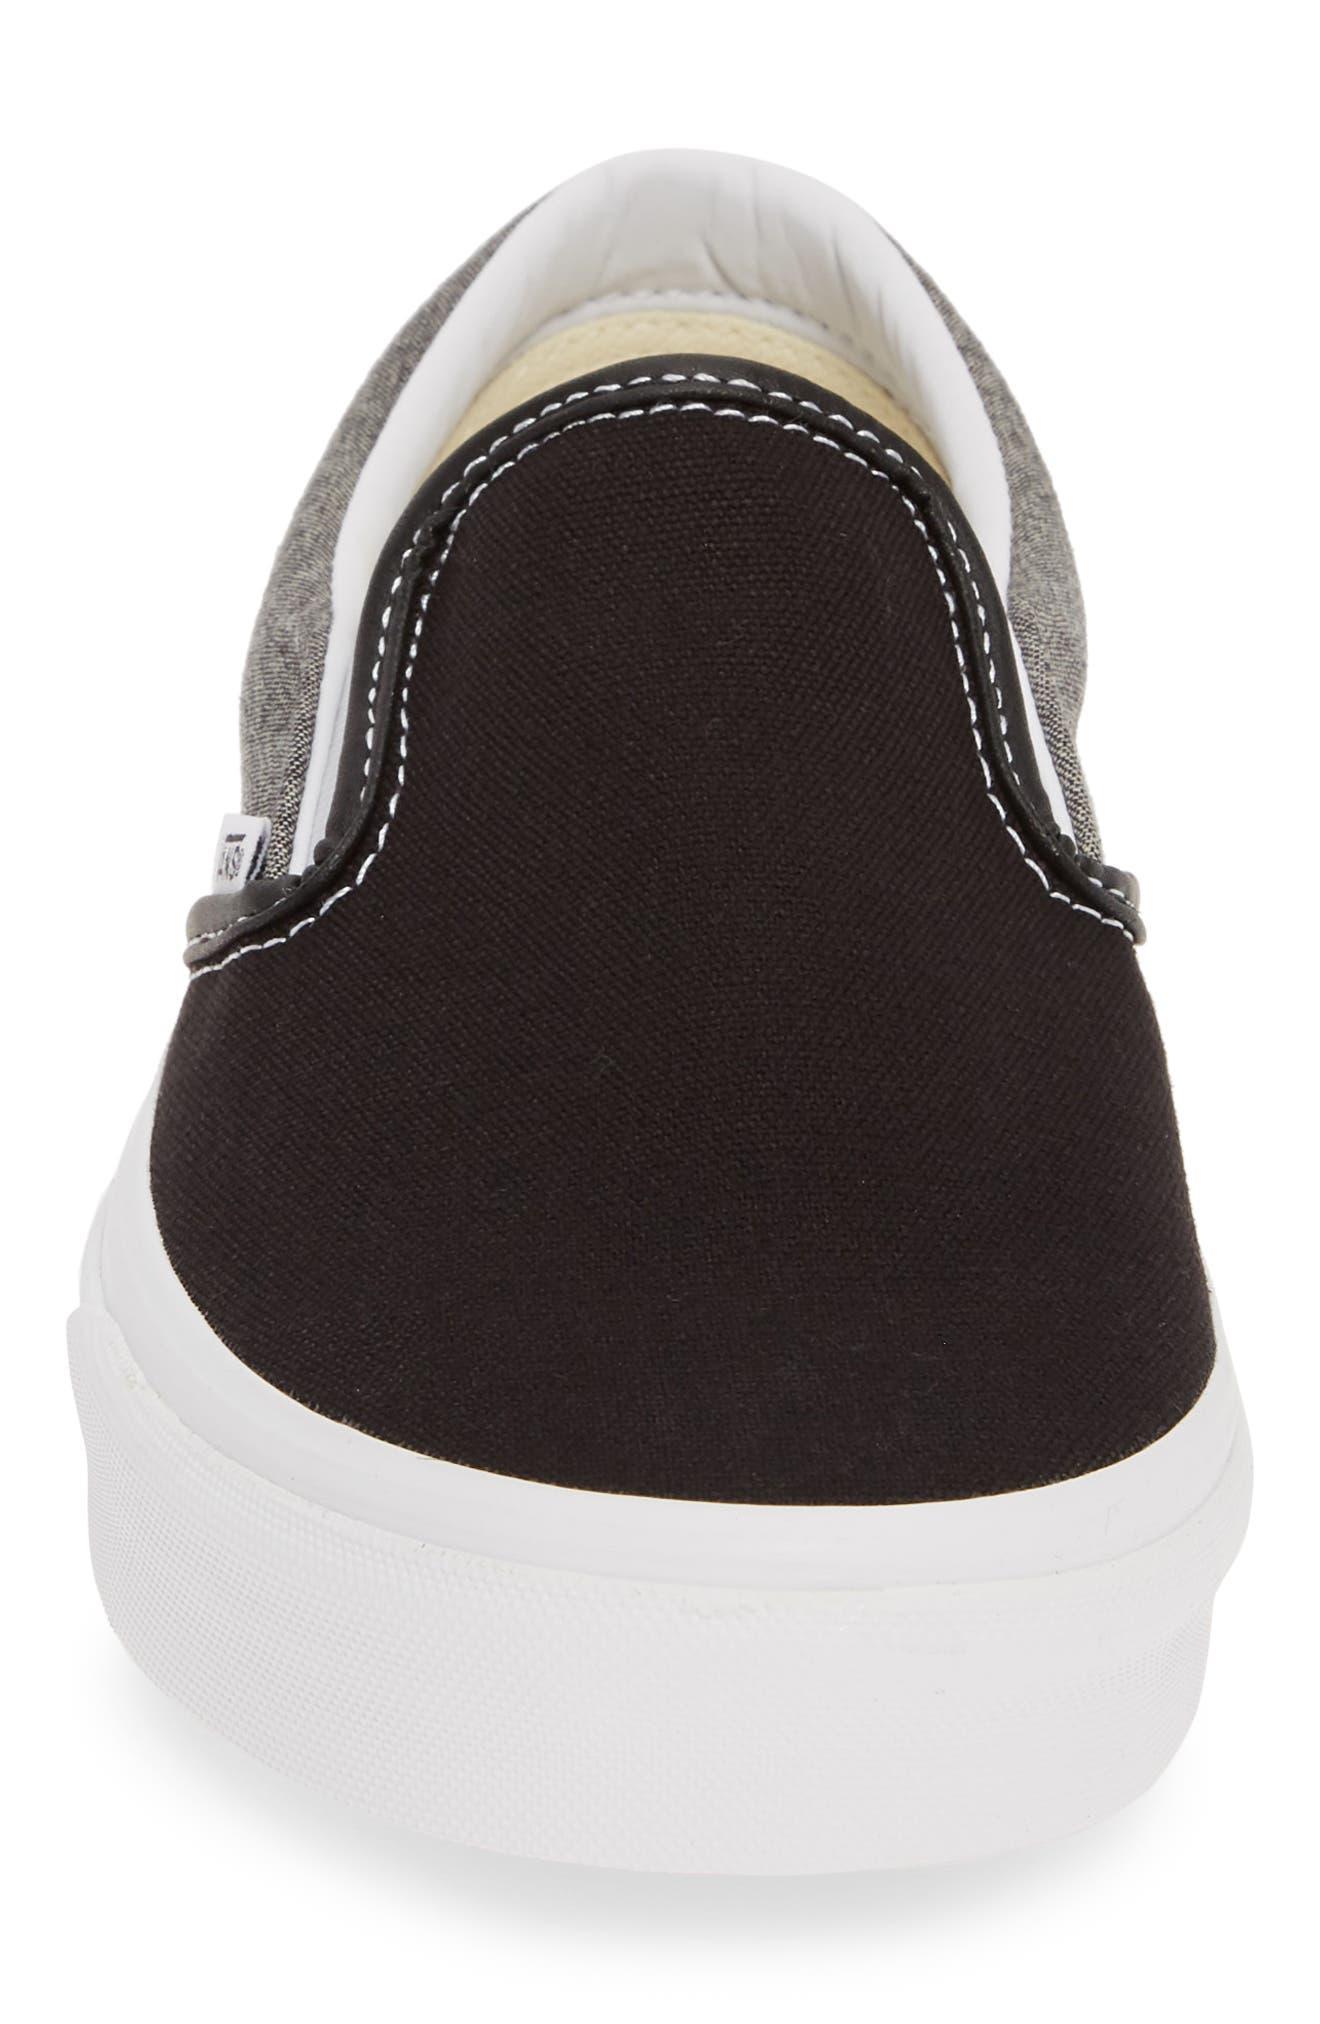 VANS, 'Classic' Slip-On Sneaker, Alternate thumbnail 4, color, CANVAS BLACK/ WHITE CHAMBRAY